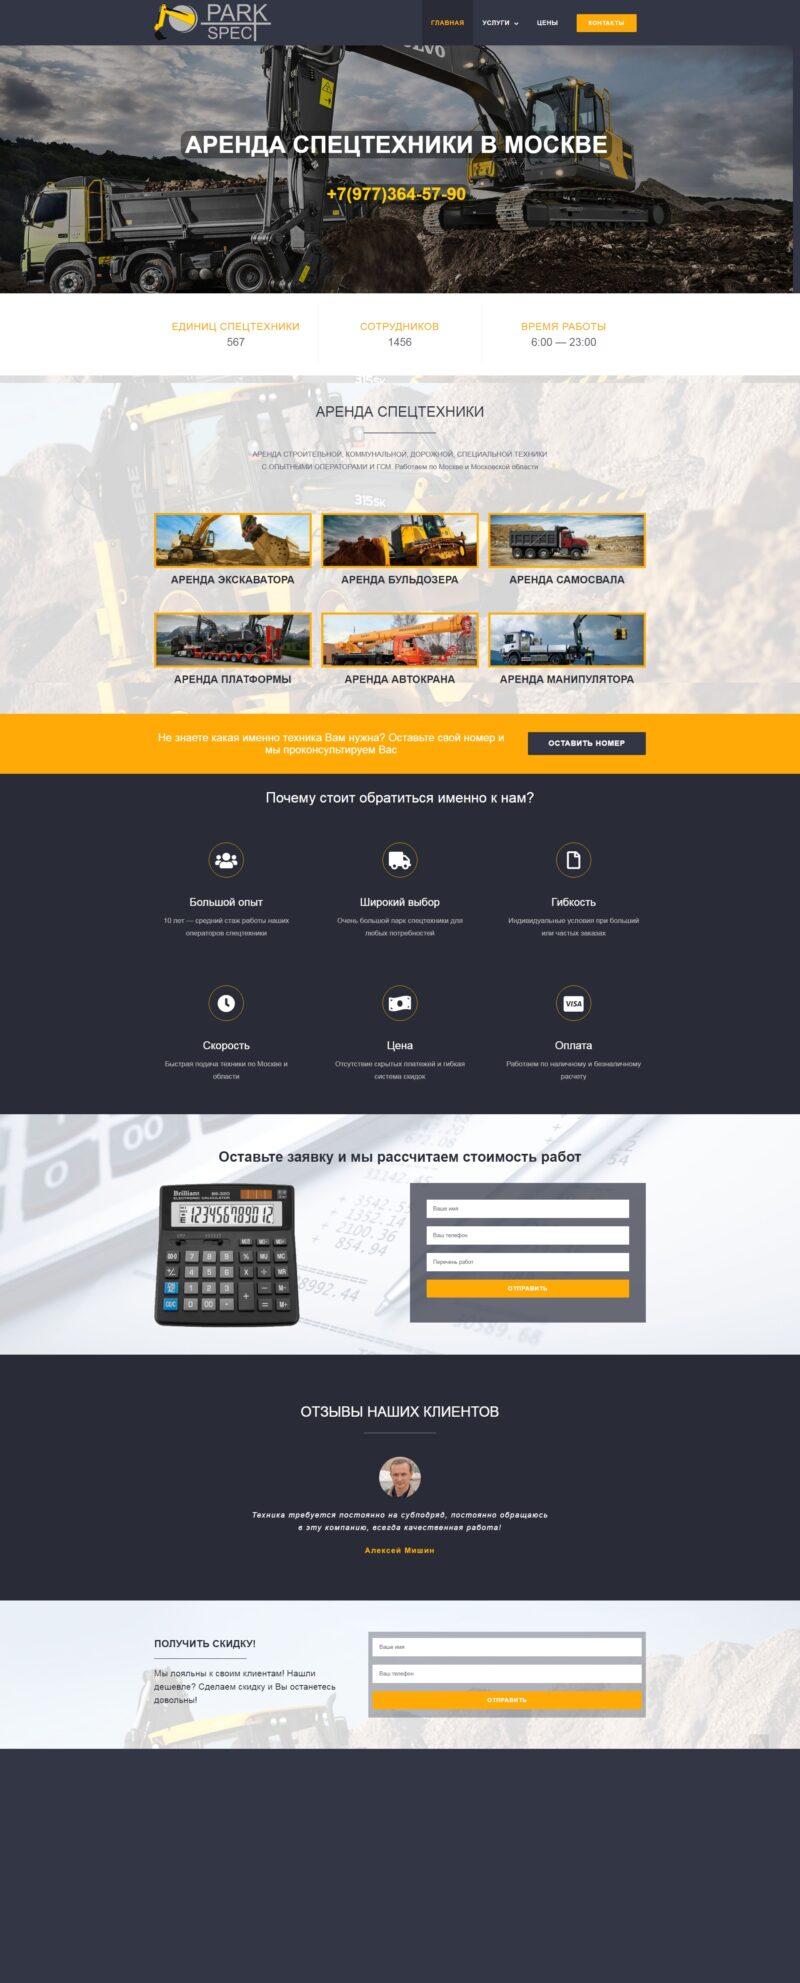 Сайт для автопарка спецтехники, г. Москва